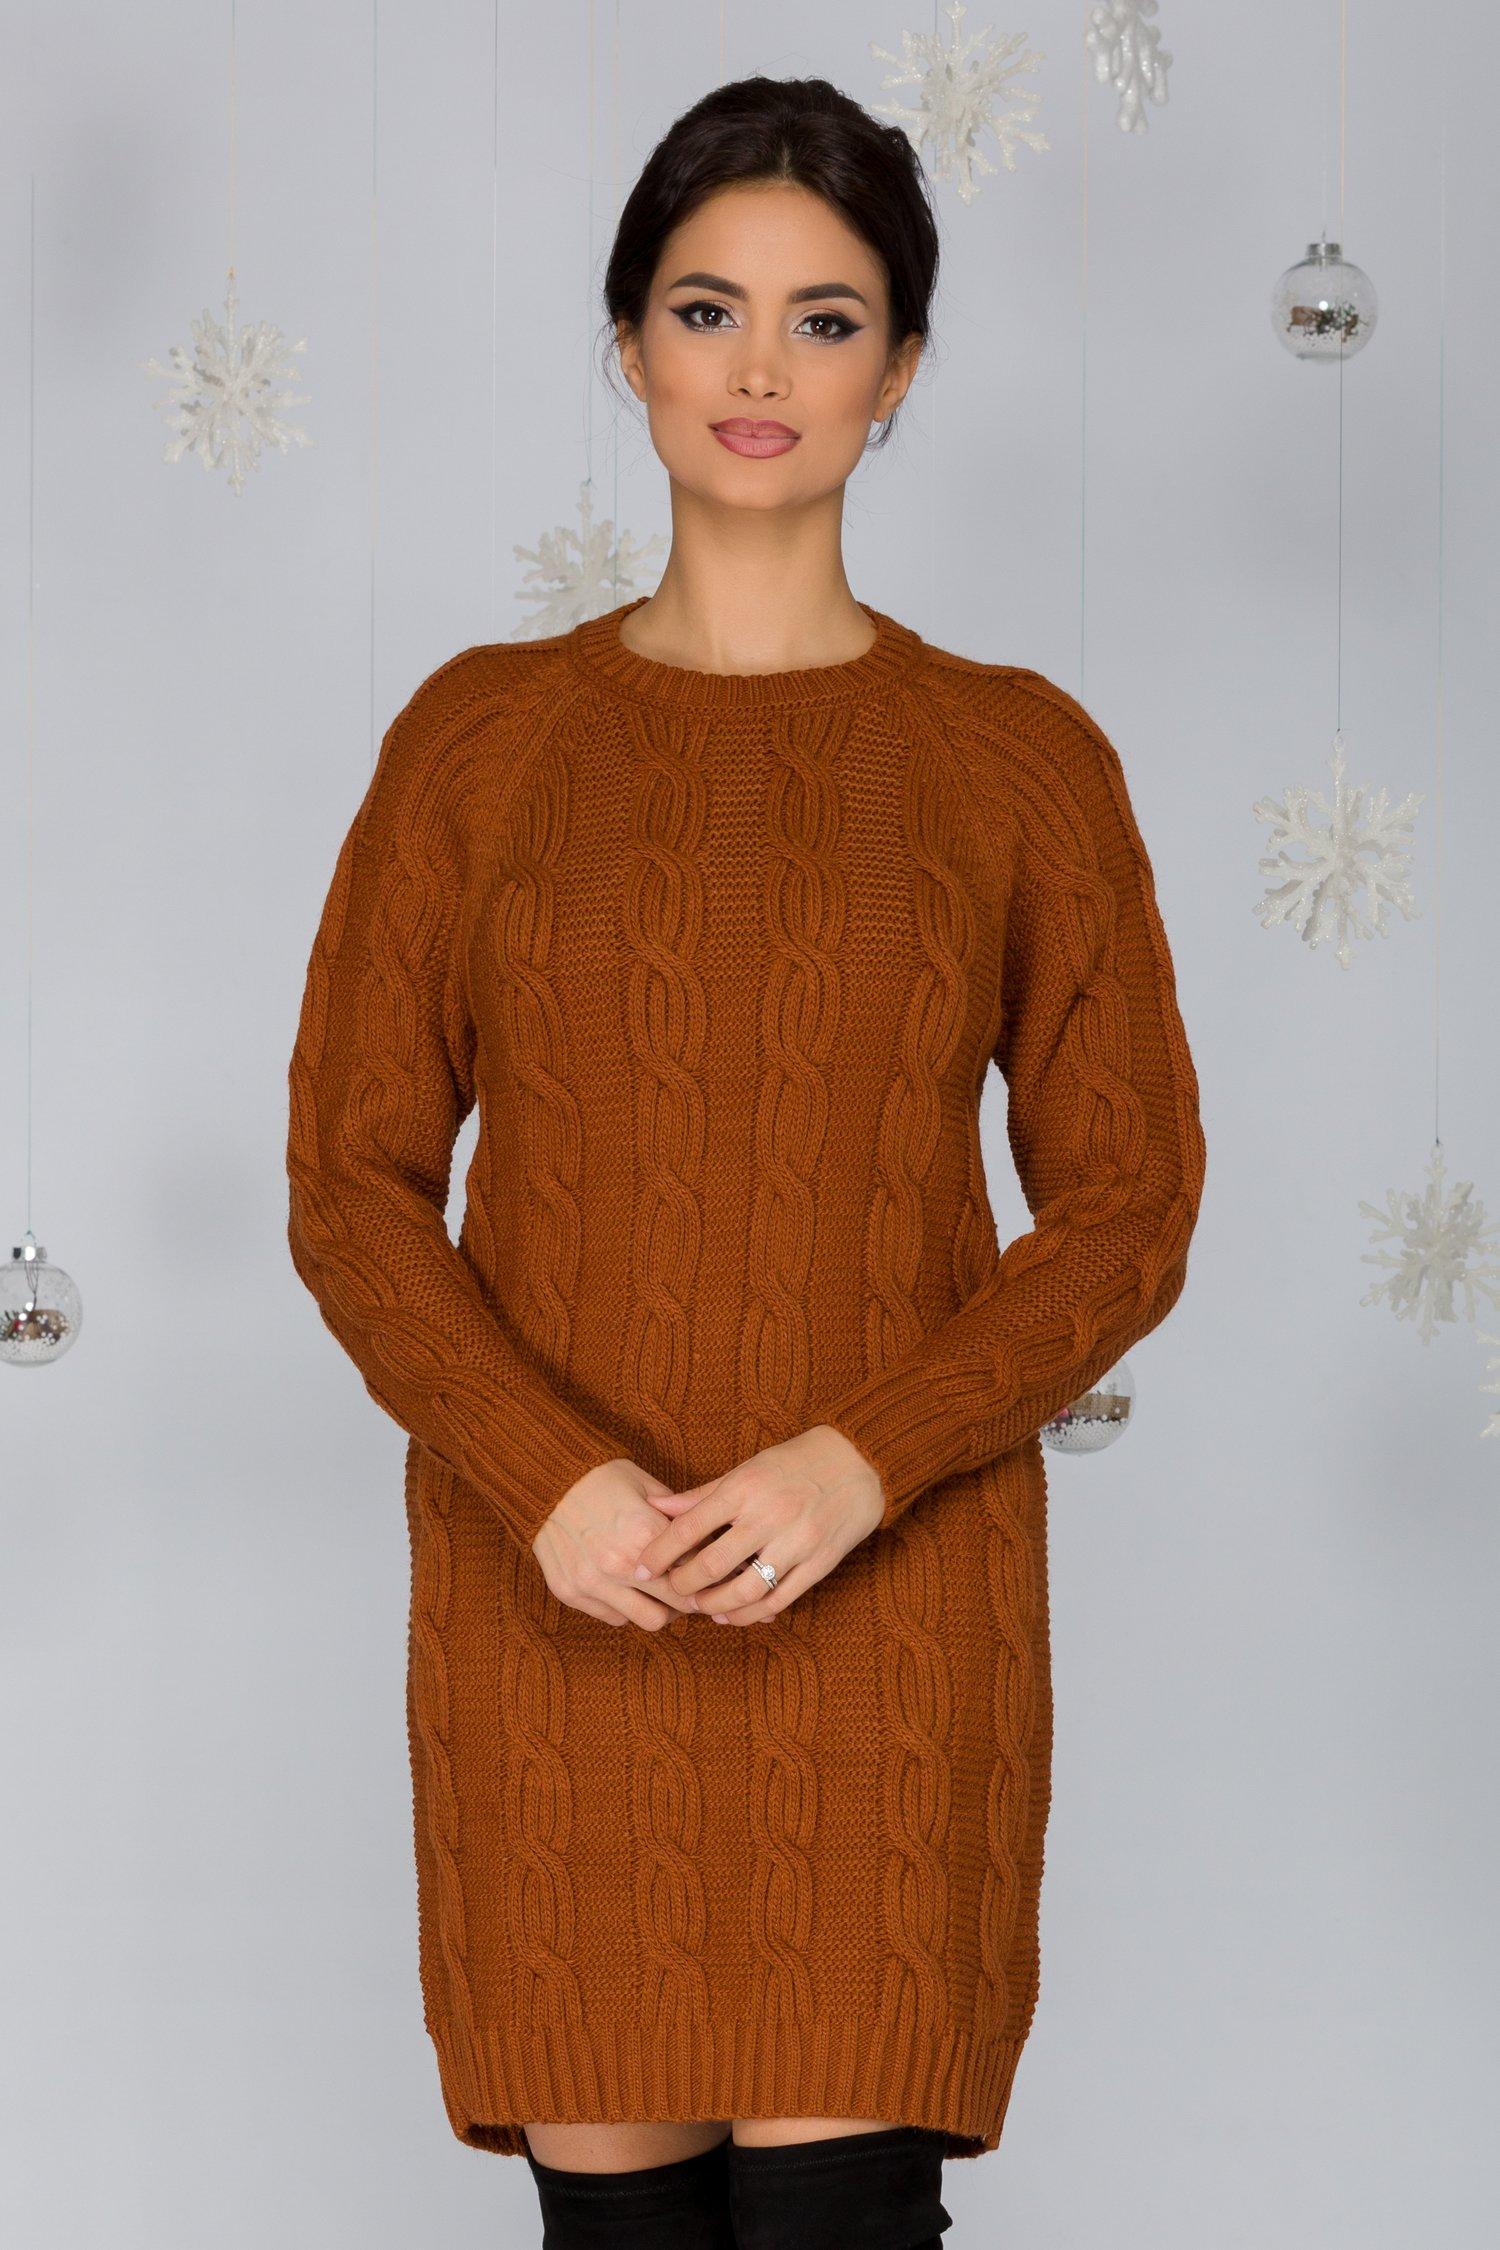 Rochia Tania maro tricotata cu model impletit